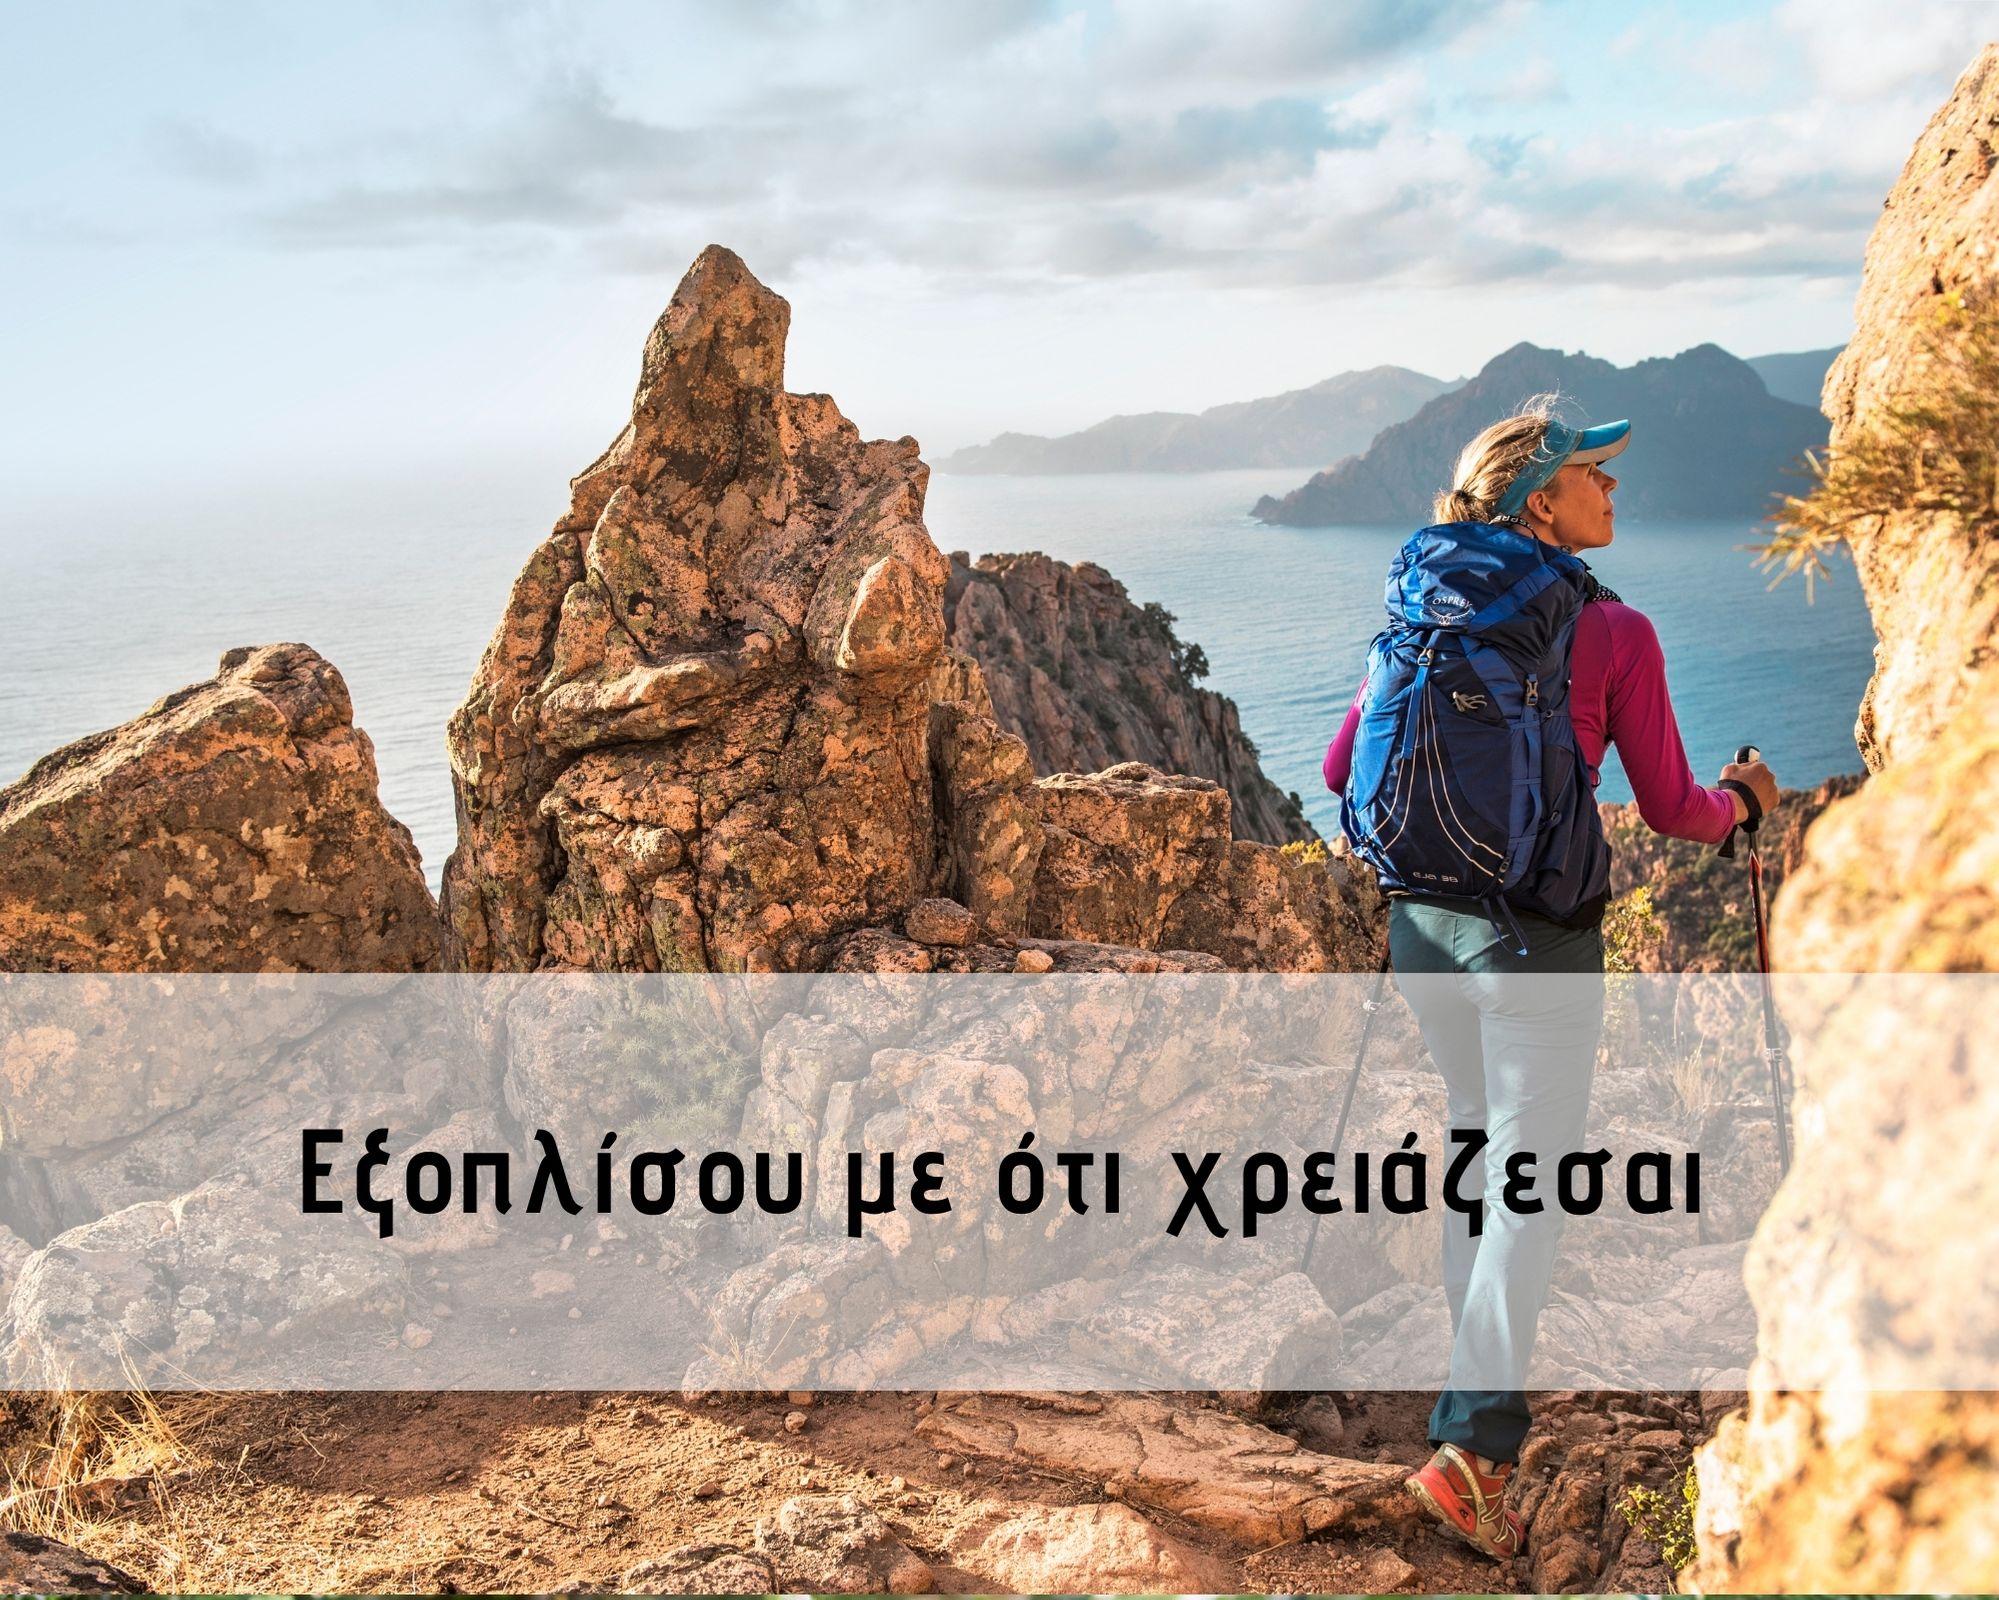 Dimitriadis Action Stores, hiking, trekking, osprey